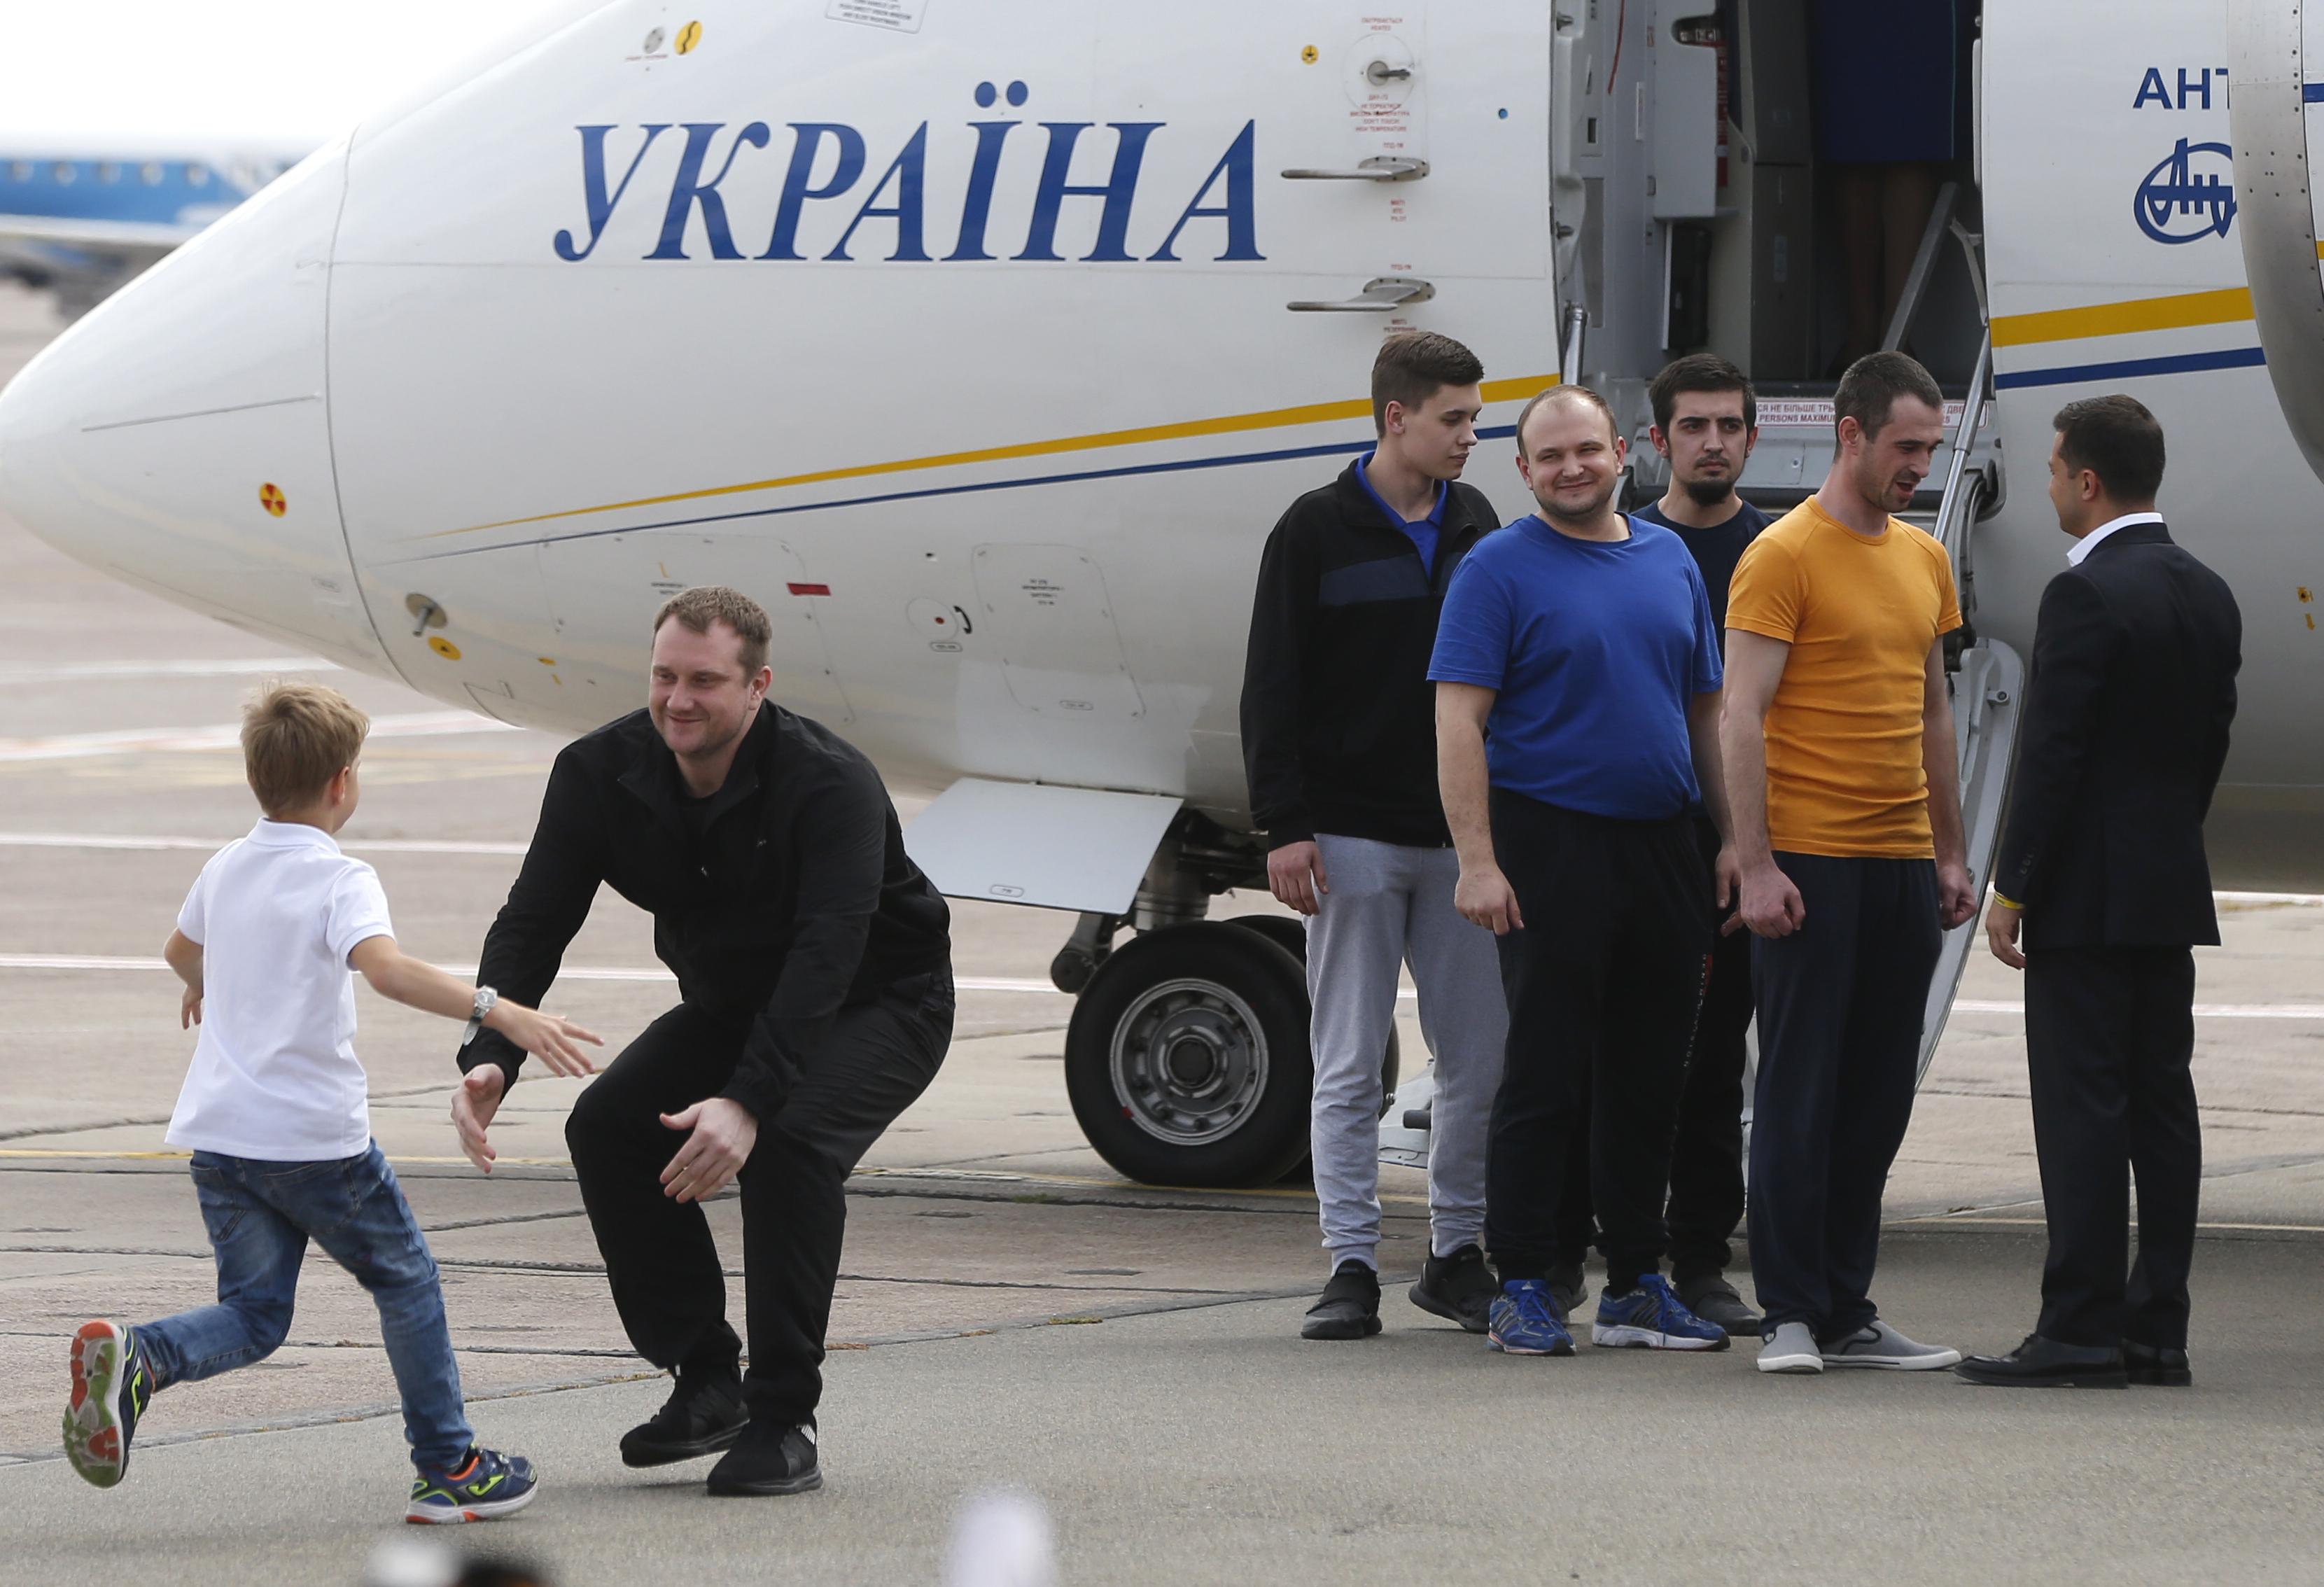 The Latest: Trump applauds Ukraine-Russia prisoner trade